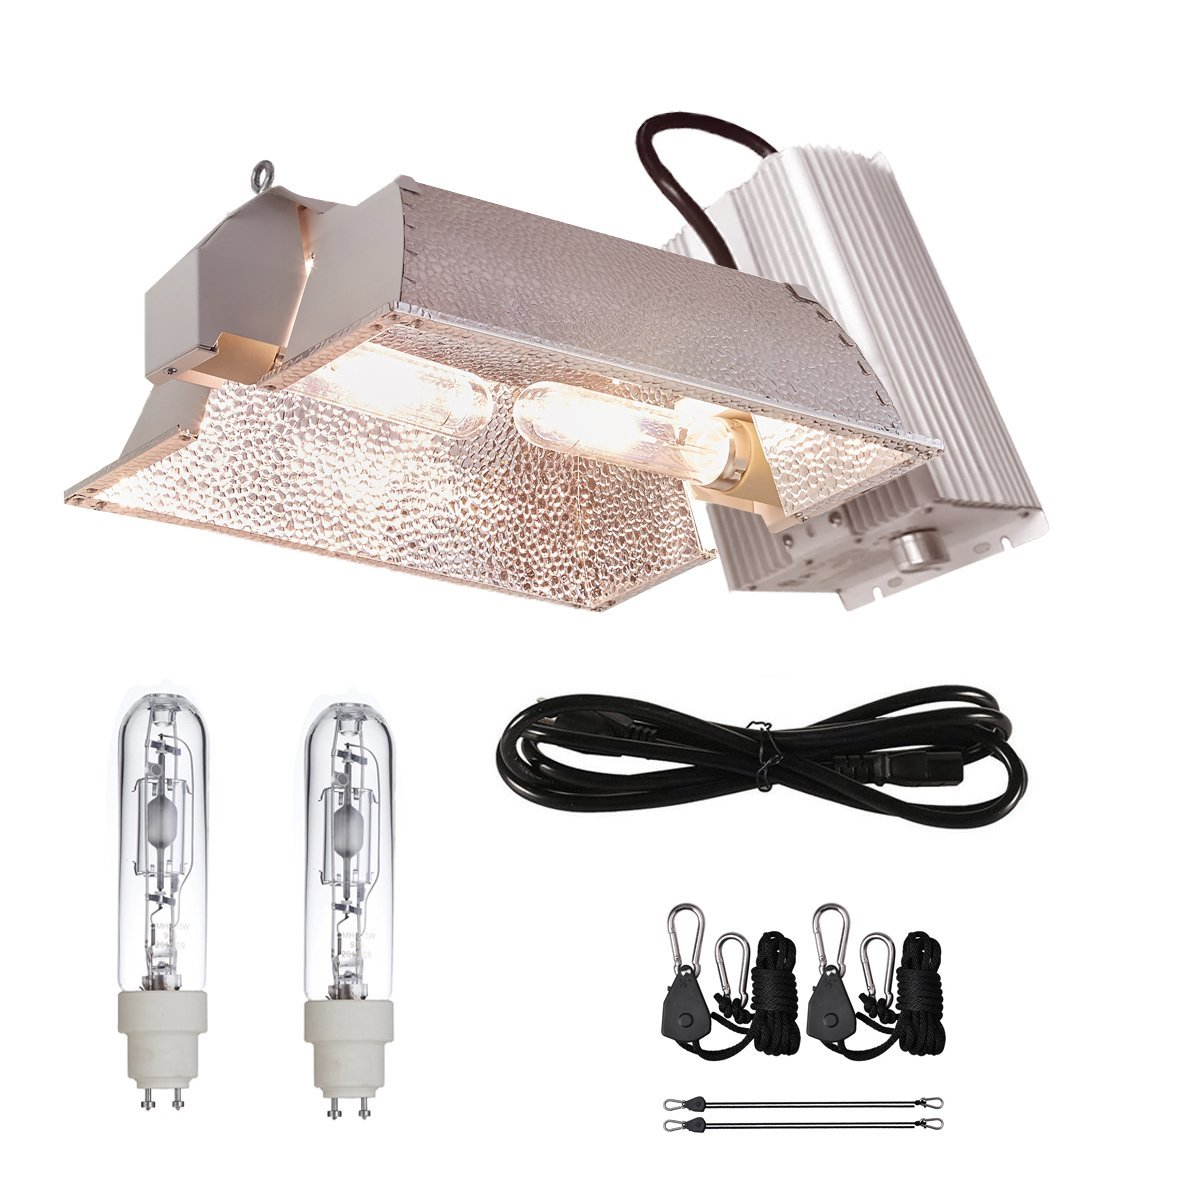 Cheap Grow Light Hanging Kit Find Grow Light Hanging Kit Deals On Line At Alibaba Com